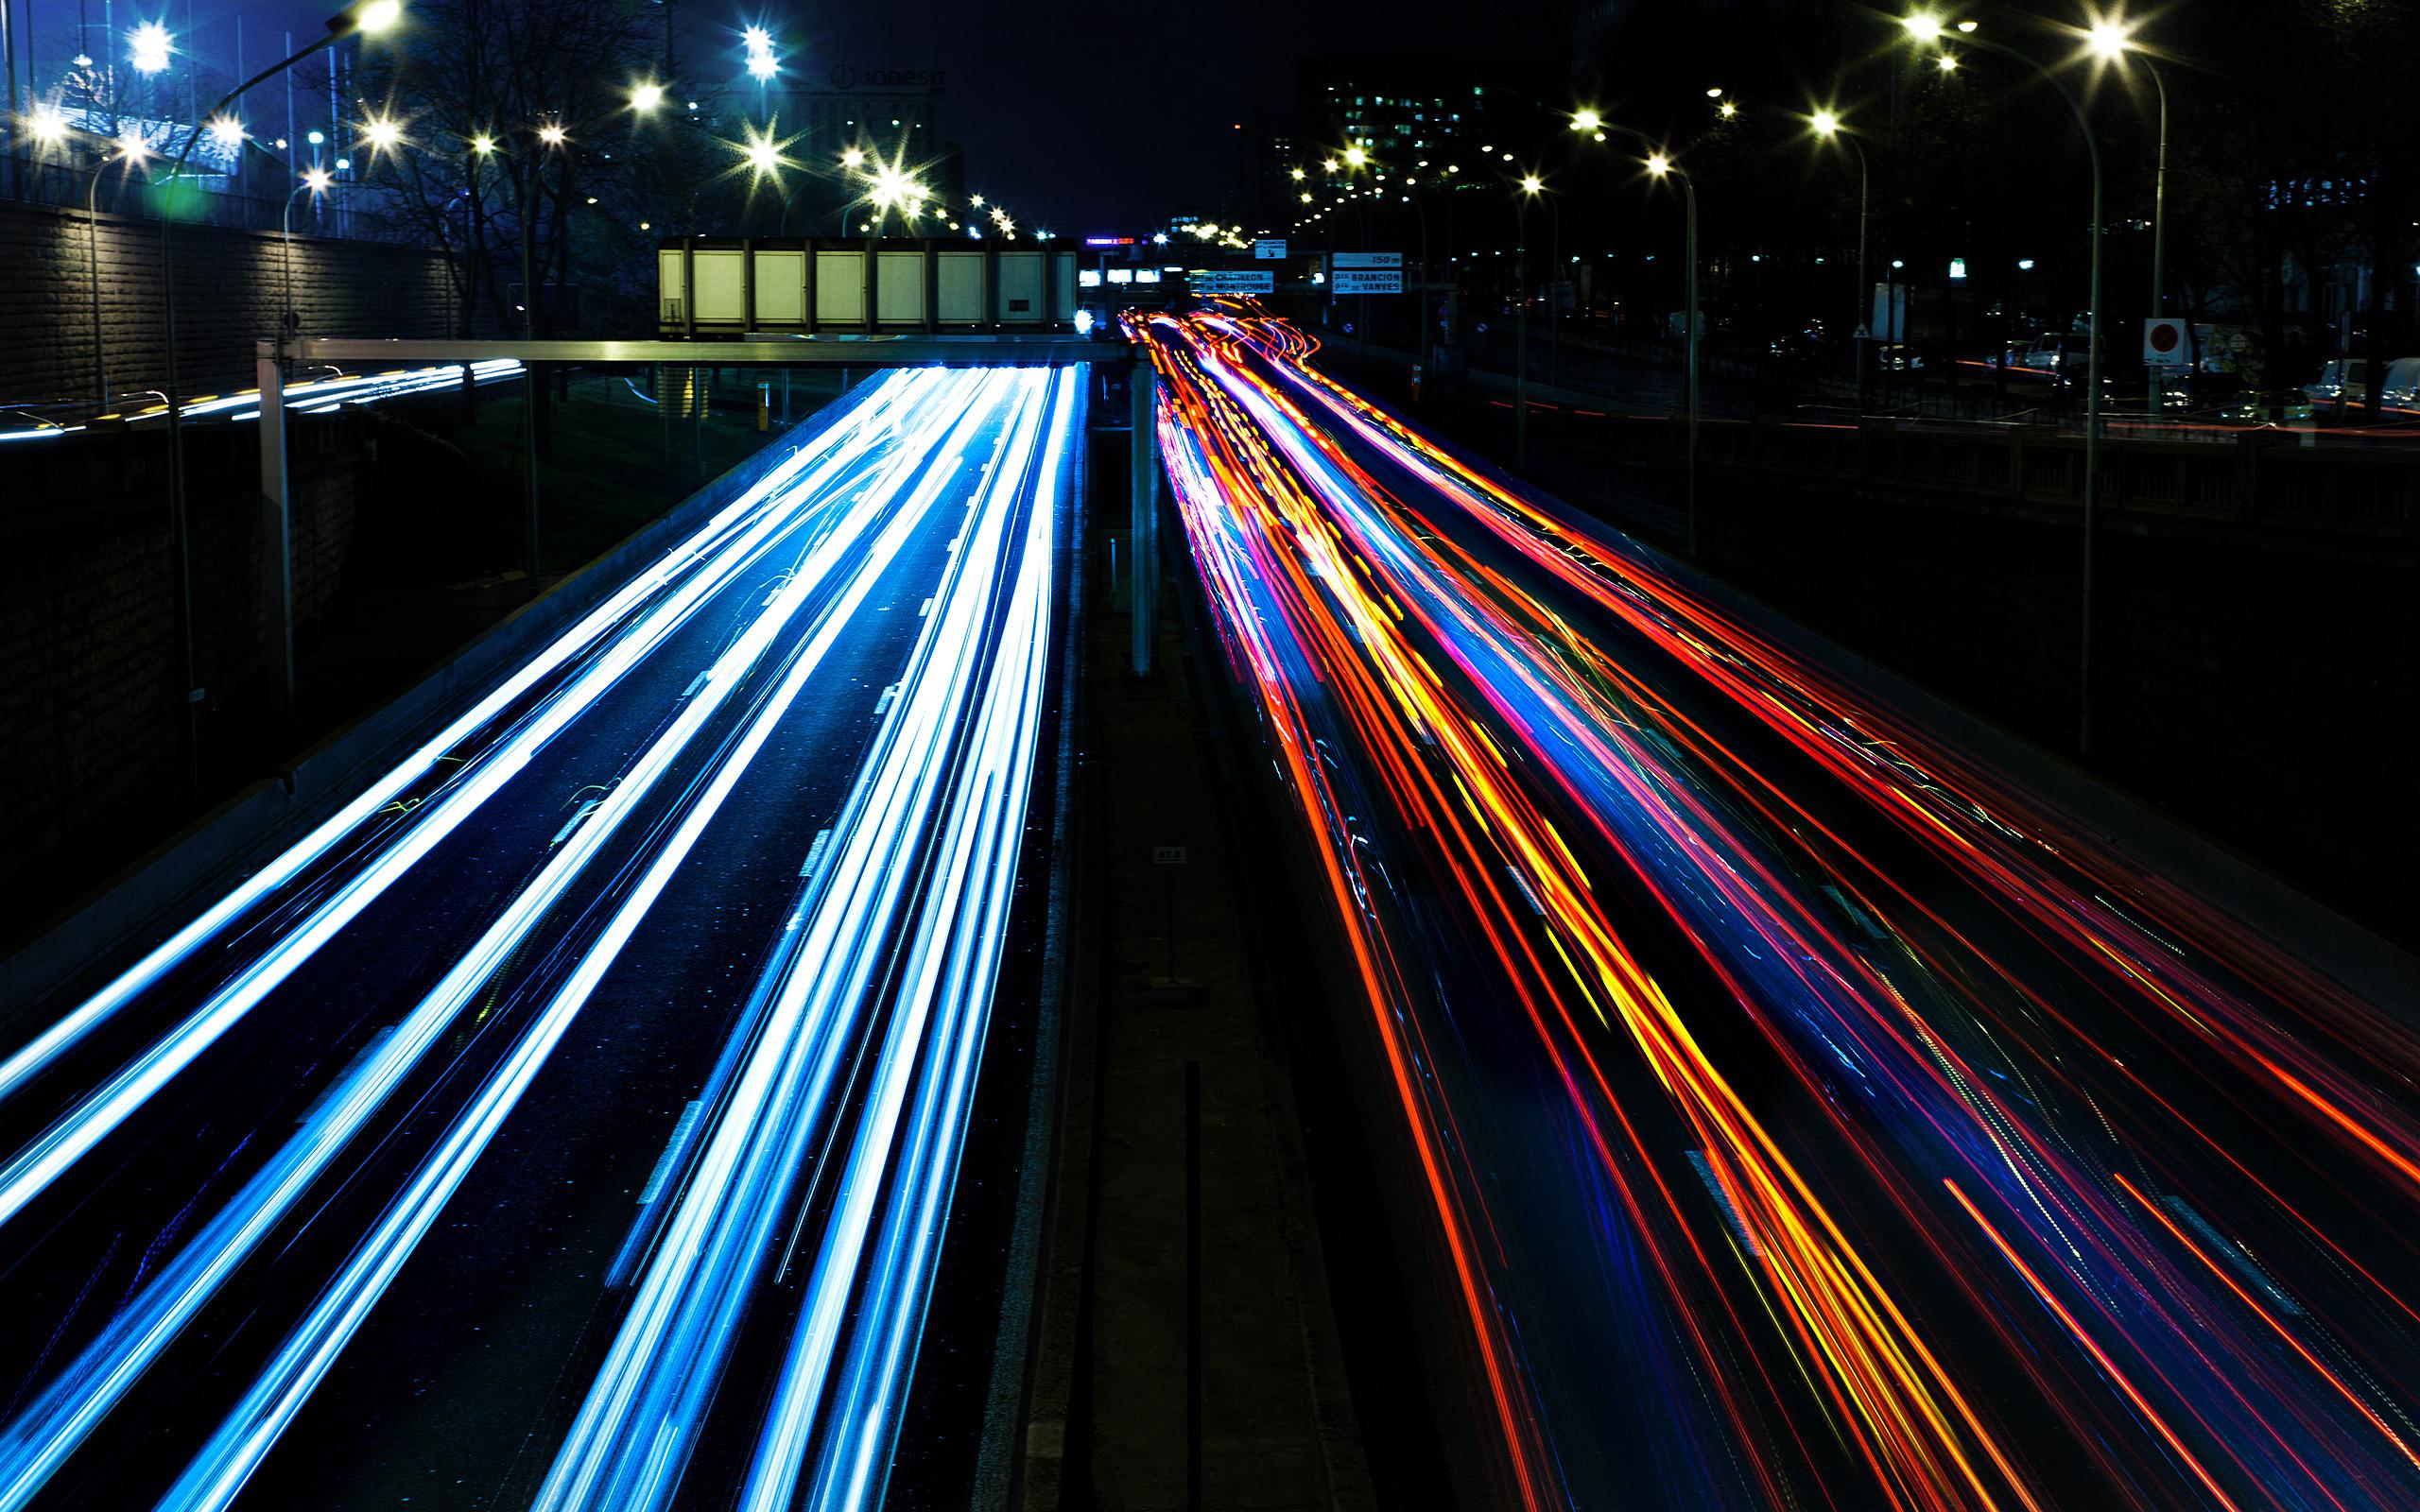 car-lights-big-city-streets-night-2560×1600.jpg | THE PILYO NEXT DOOR